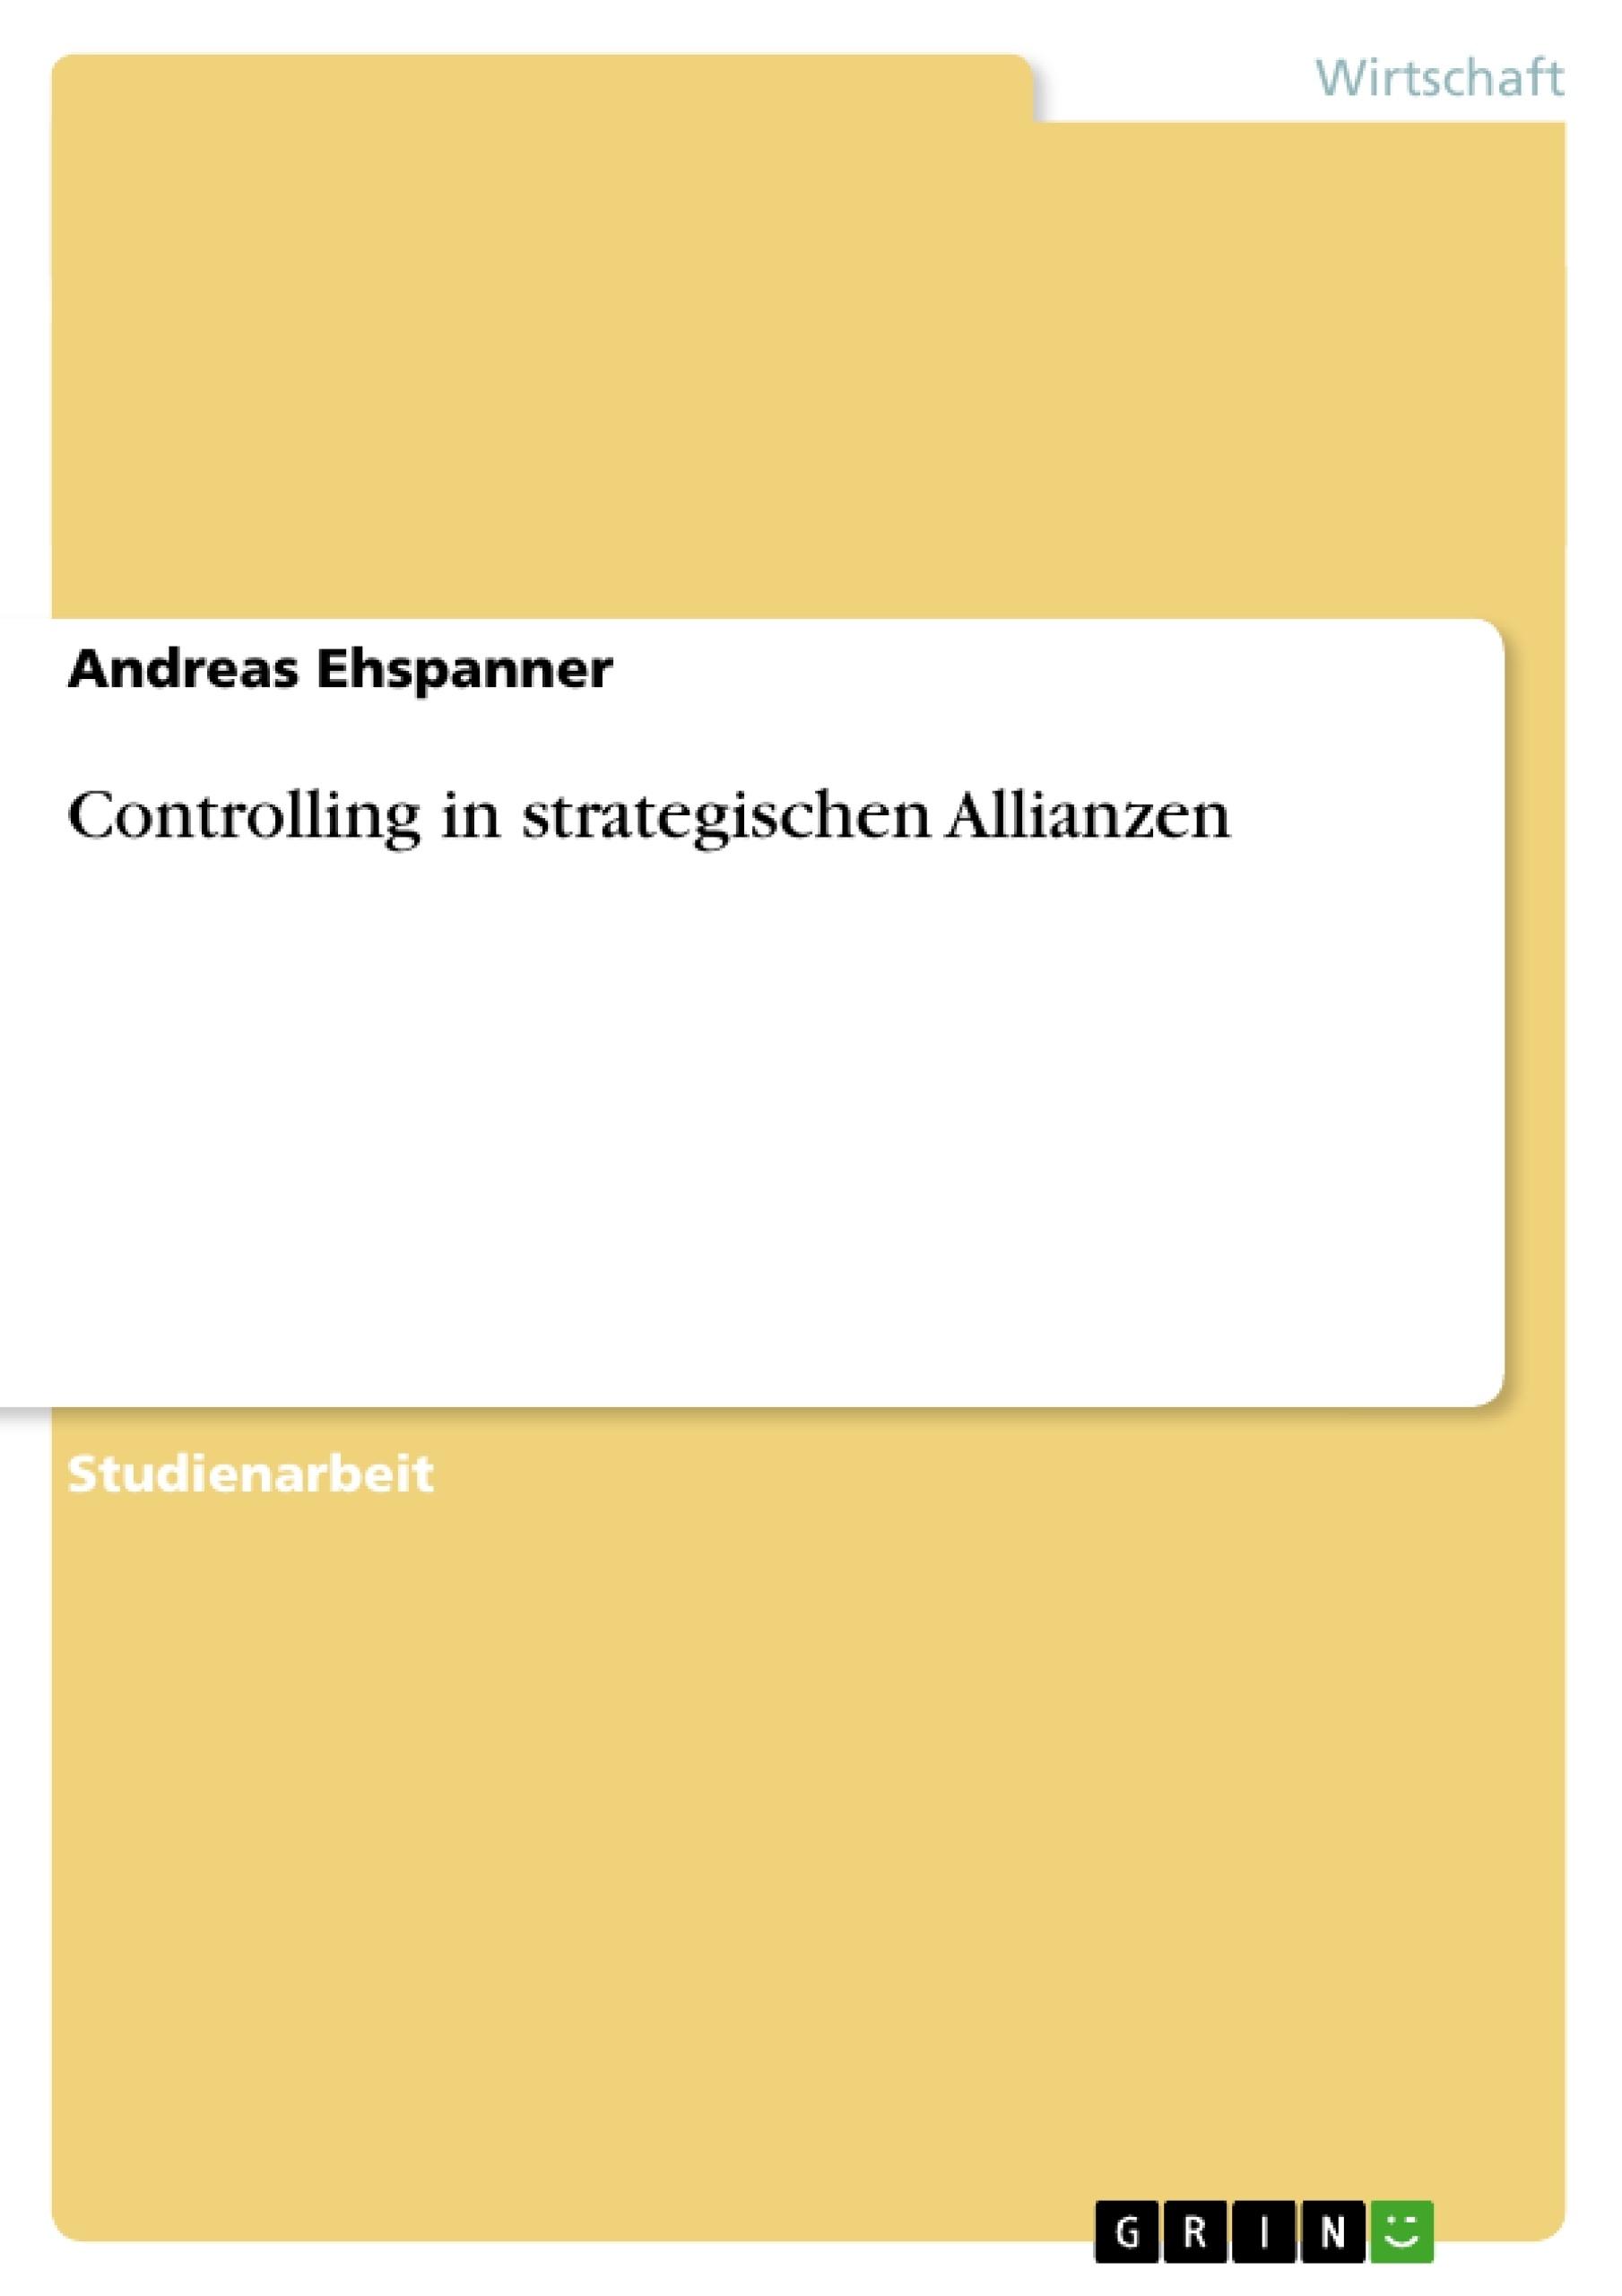 Titel: Controlling in strategischen Allianzen